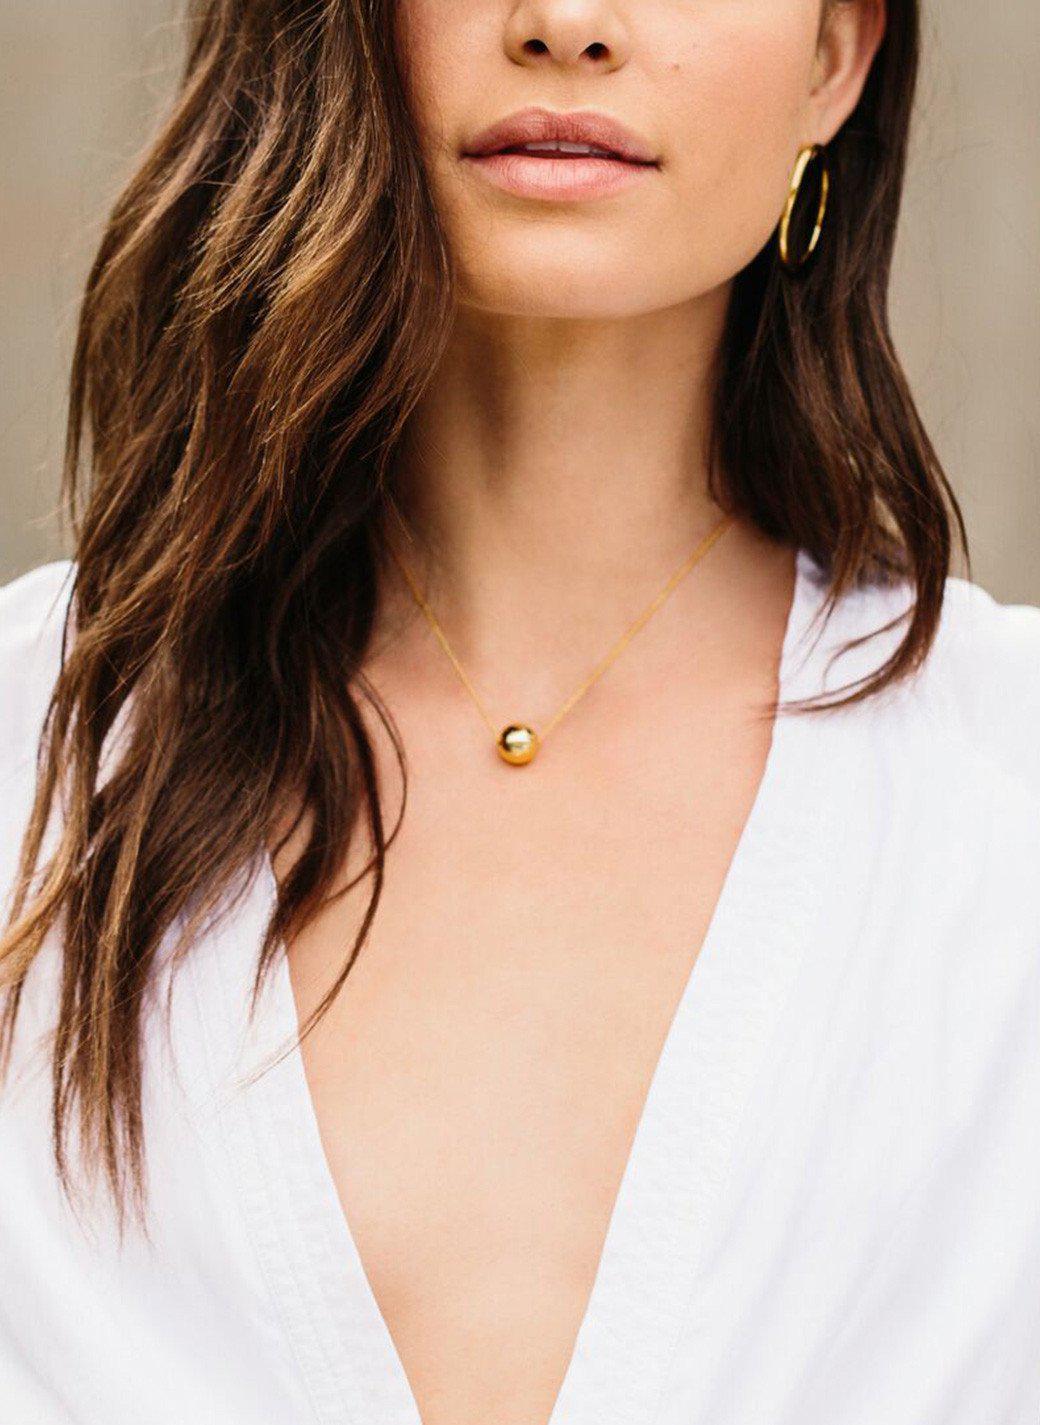 Gorjana & Griffin Newport Adjustable Necklace